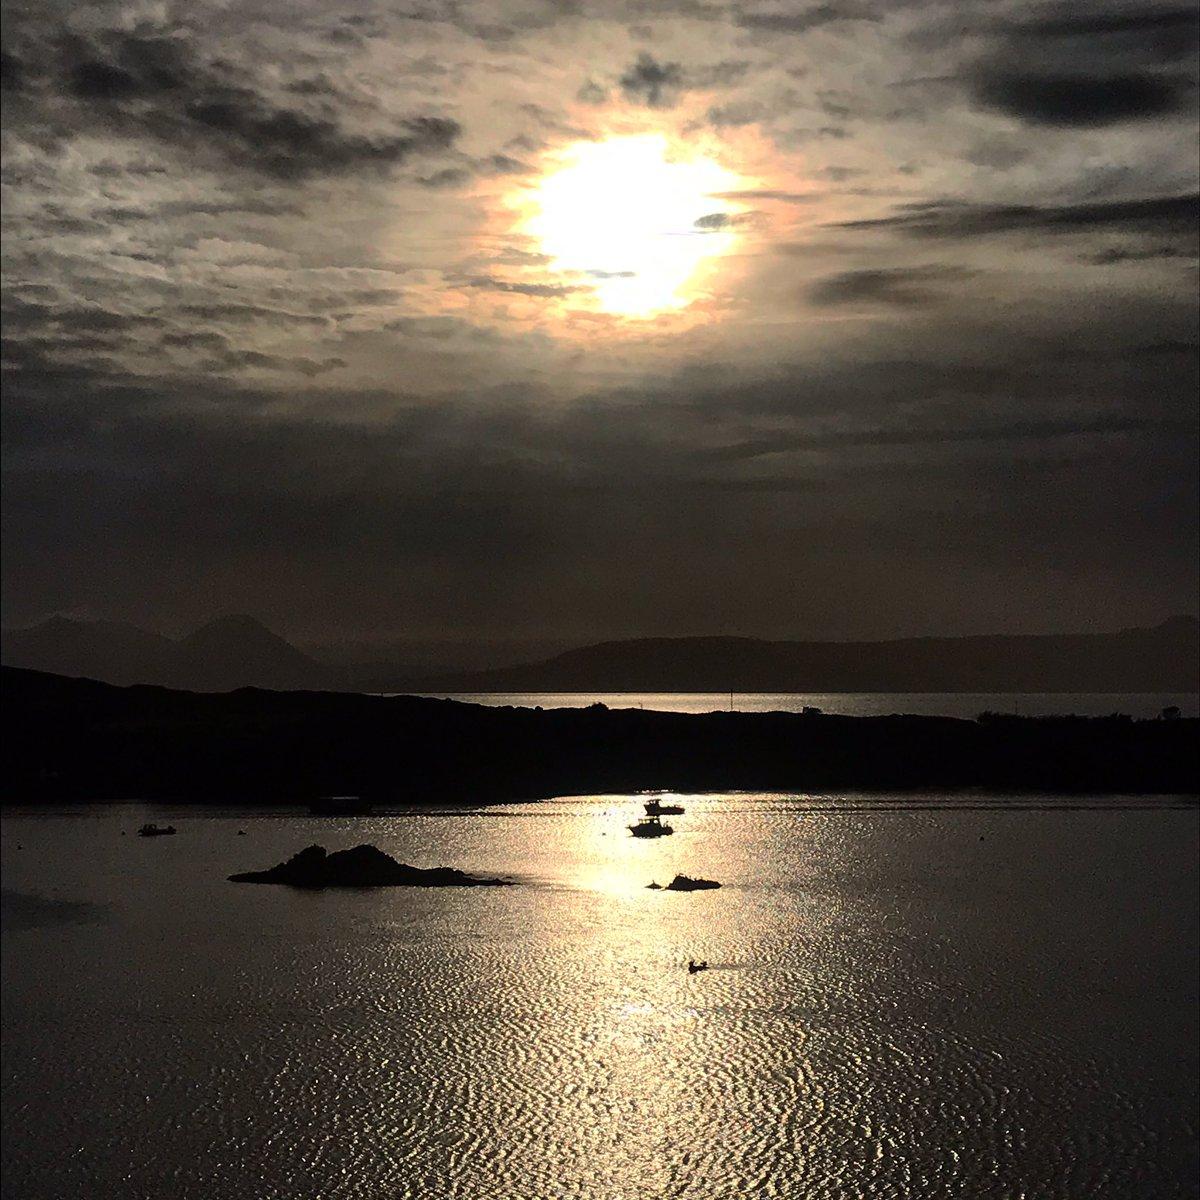 Goodnight #goodnight #sunset #nc500 #vanlife #inavanwithaverylooseplan #roadtrip #ontheroad #headspace #dadsandladsontour #lifesbetterbythesea #wildswimming #wildcamping #ifeverybodyhadanocean #bluemind #keepyourdistance #willbetuckedupbyten https://t.co/F1FakBfNYc